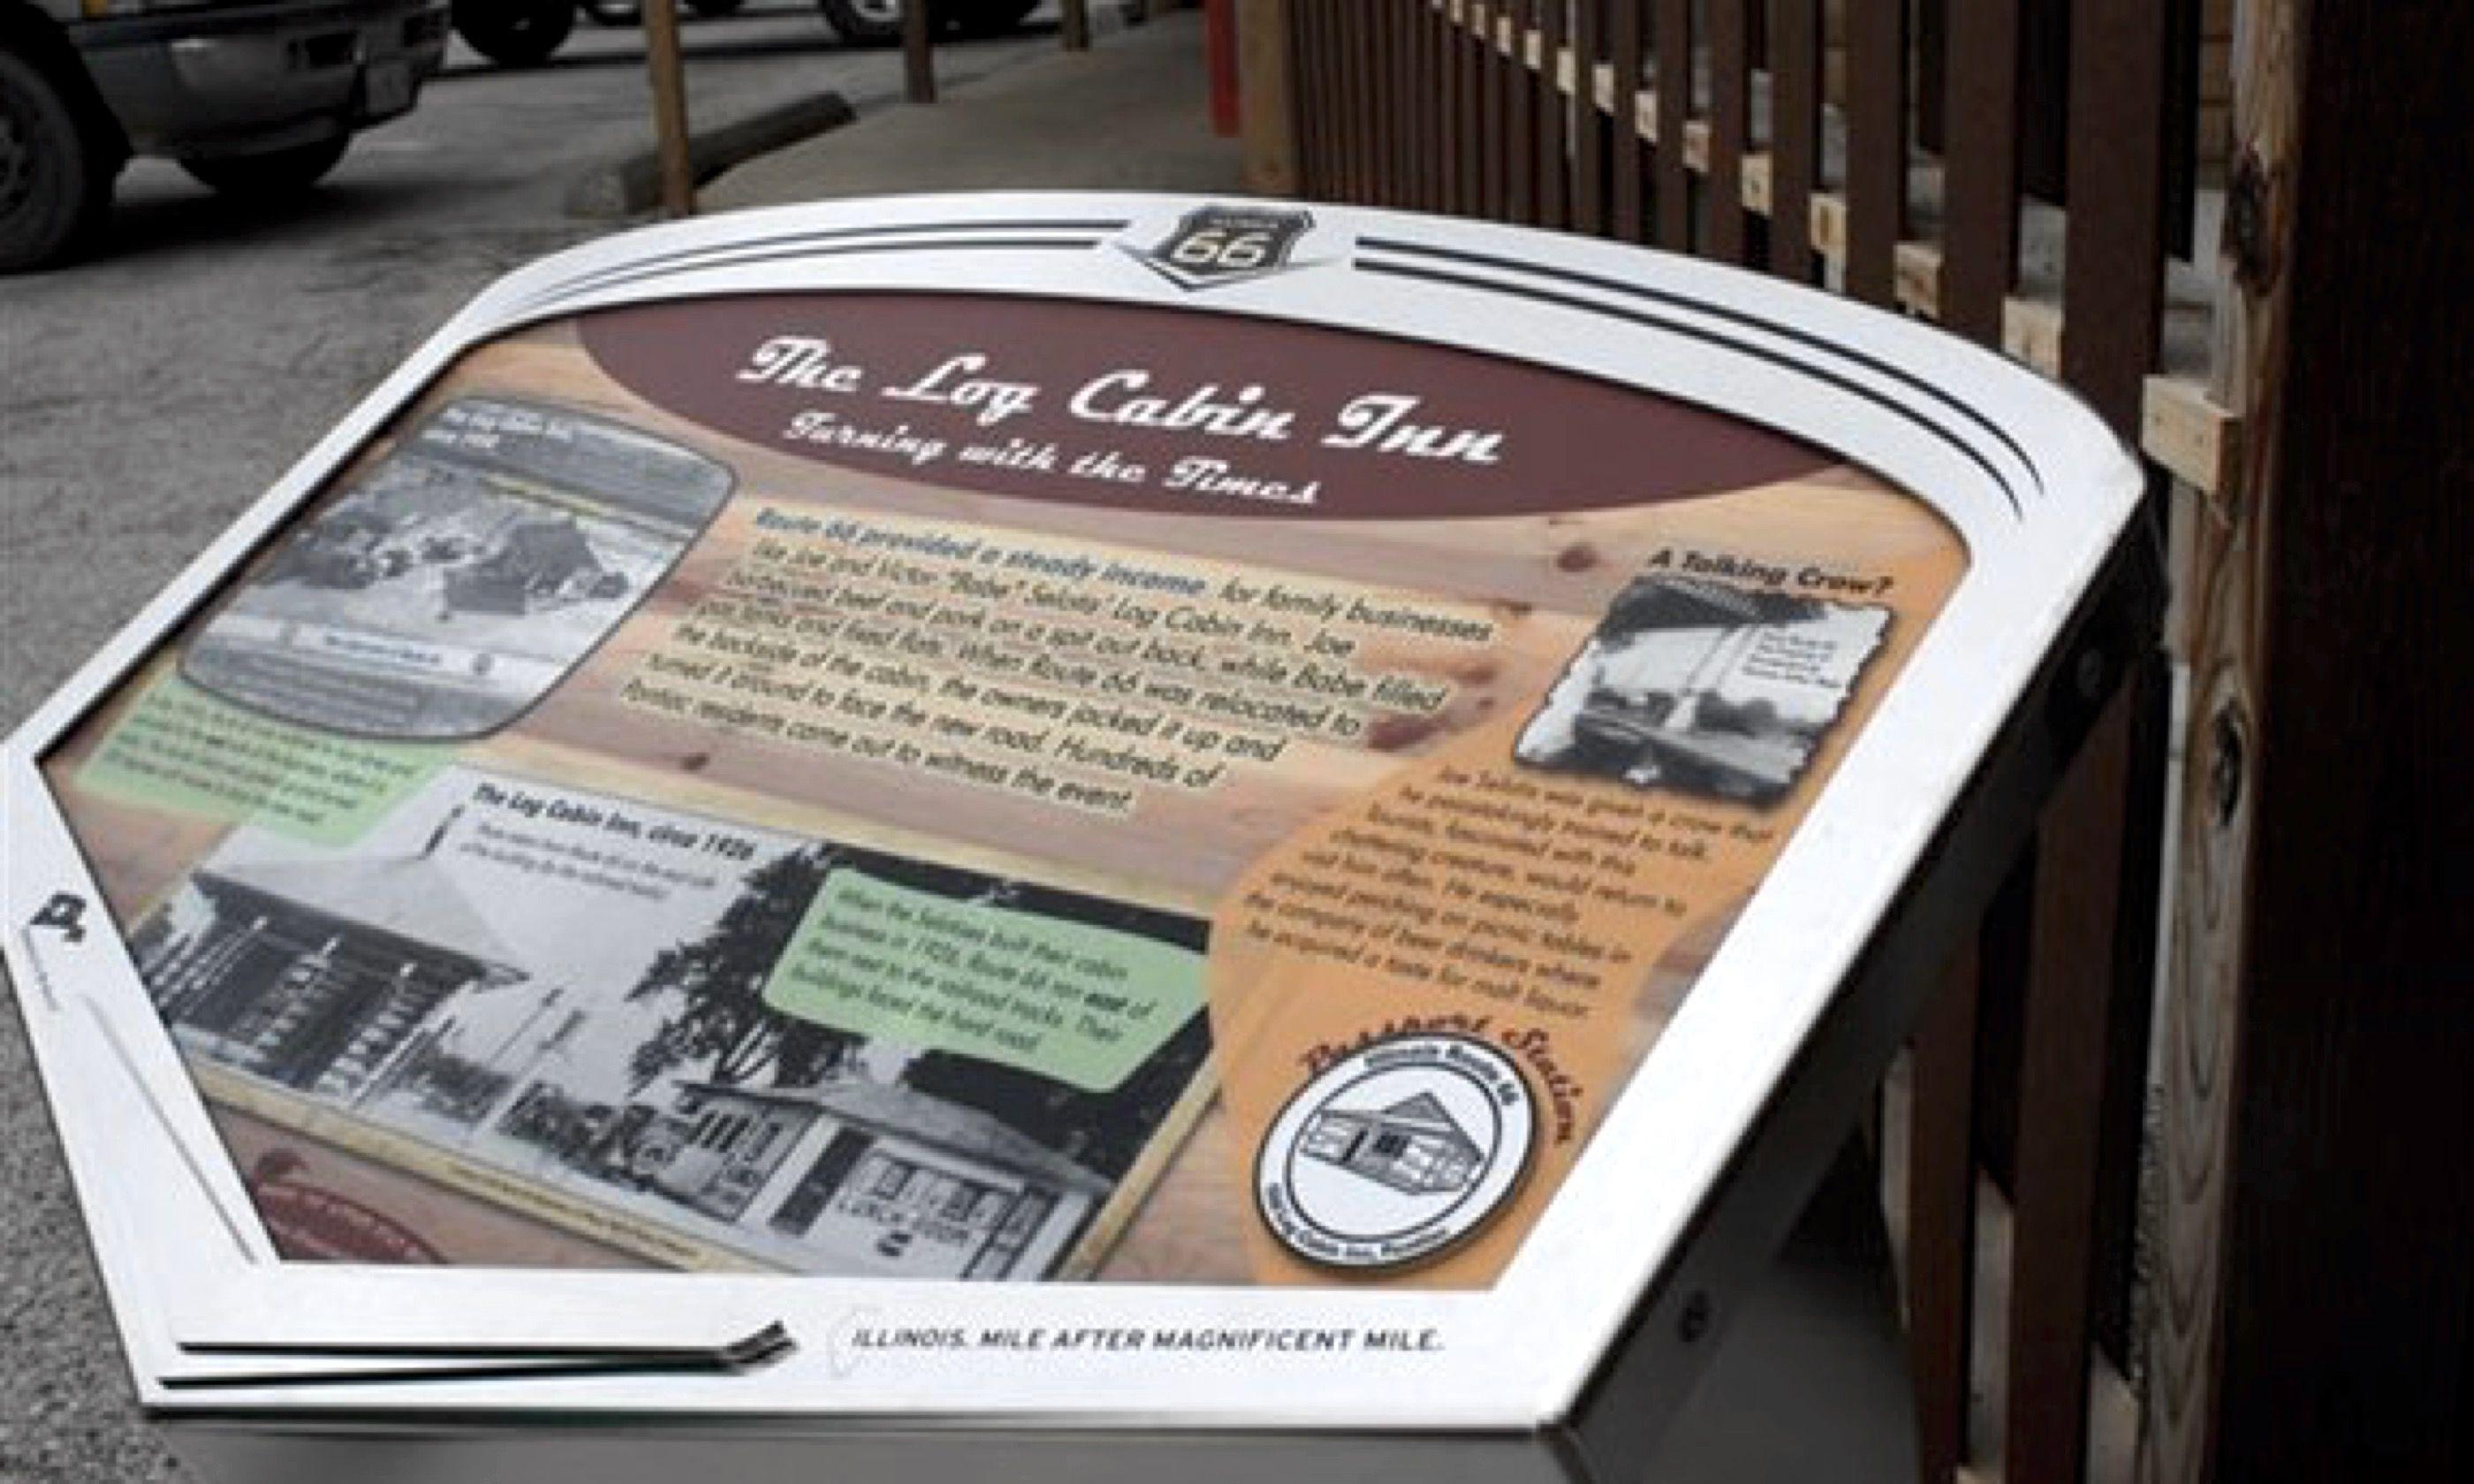 Wayside exhibit for The Log Cabin Inn (www.enjoyillinois.com)